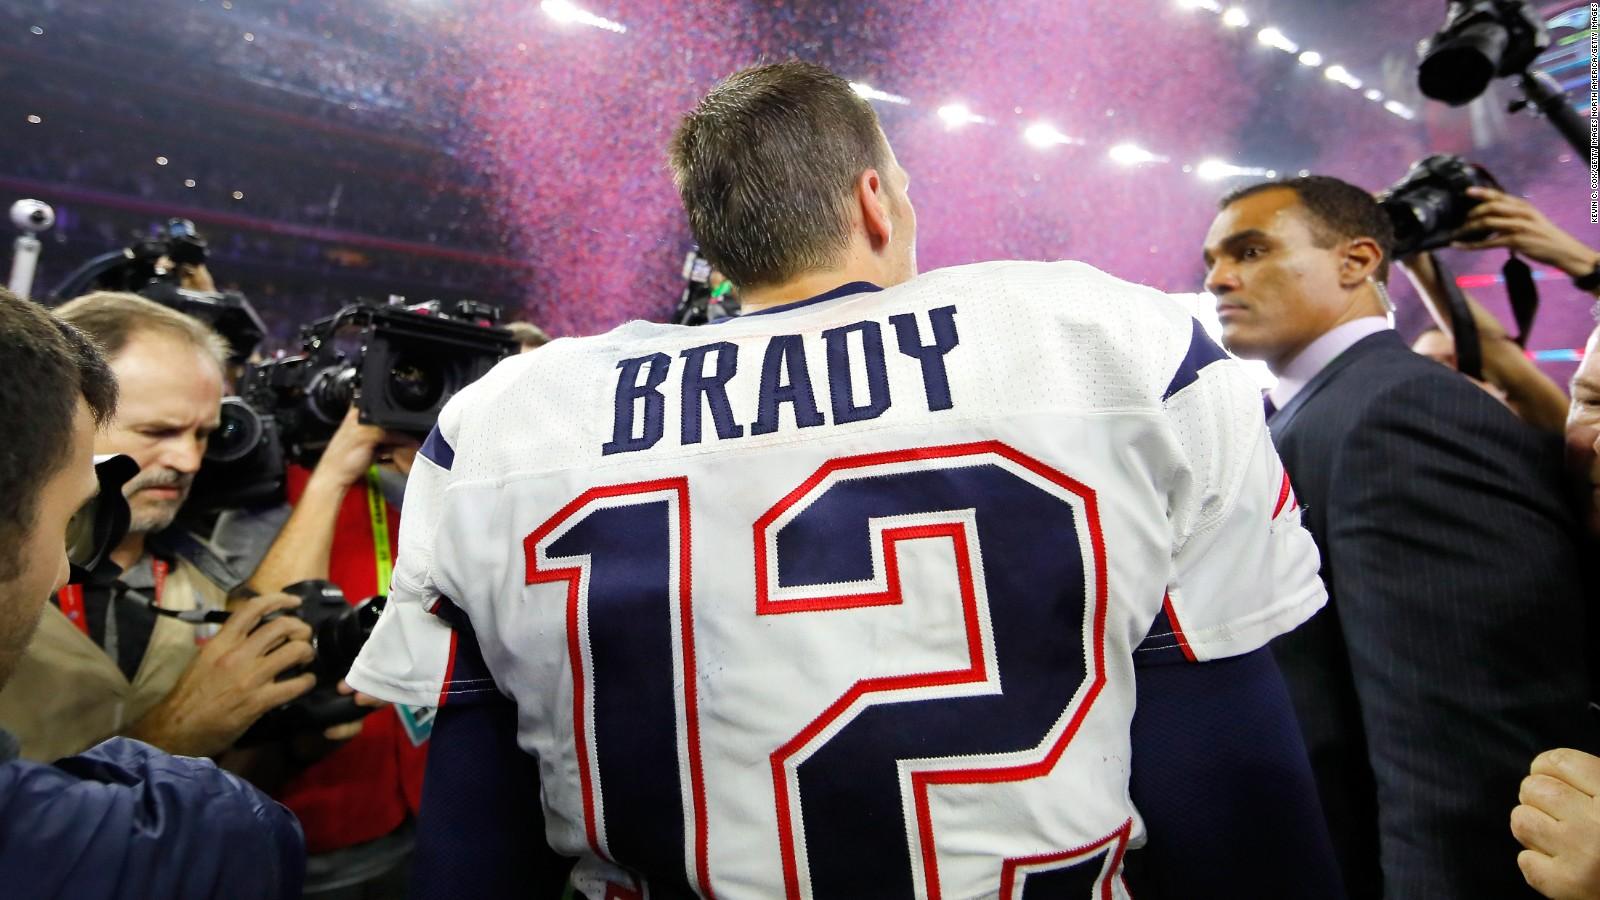 Tom Brady s stolen Super Bowl jerseys recovered in Mexico CNN